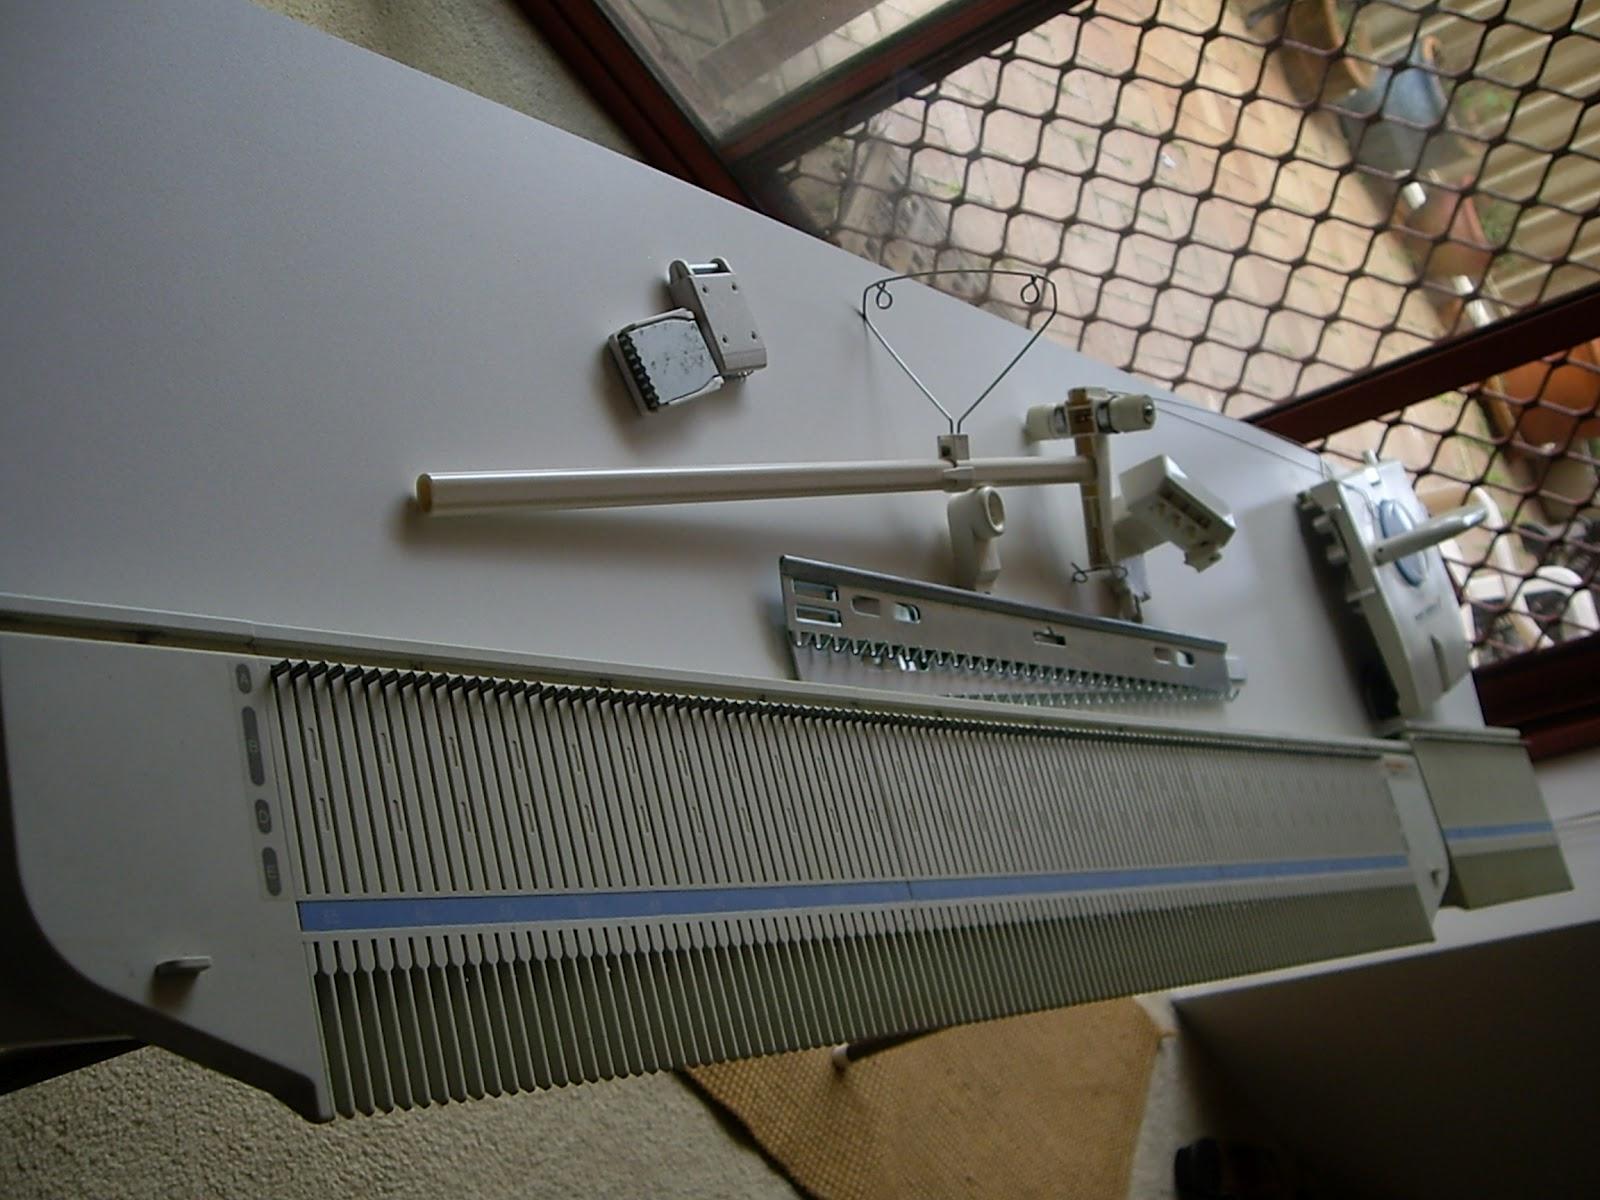 Ozlornas Knitting Blog Kx350 1 Panel 176 Needles Ready To Go